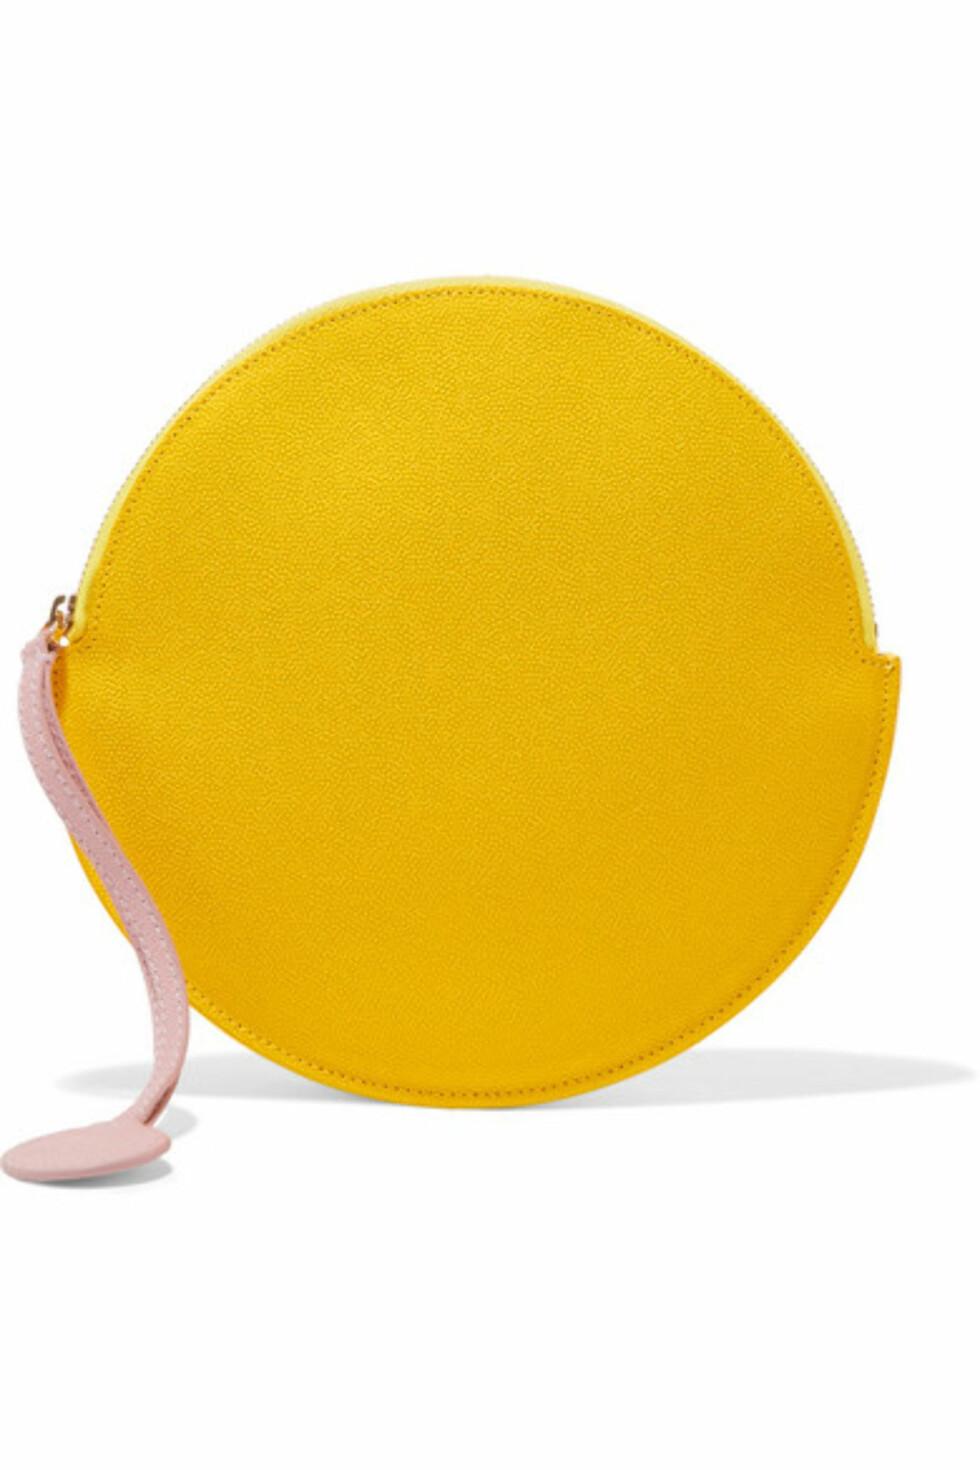 Veske fra Roksanda  3200,-  https://www.net-a-porter.com/gb/en/product/1041593/roksanda/textured-leather-pouch